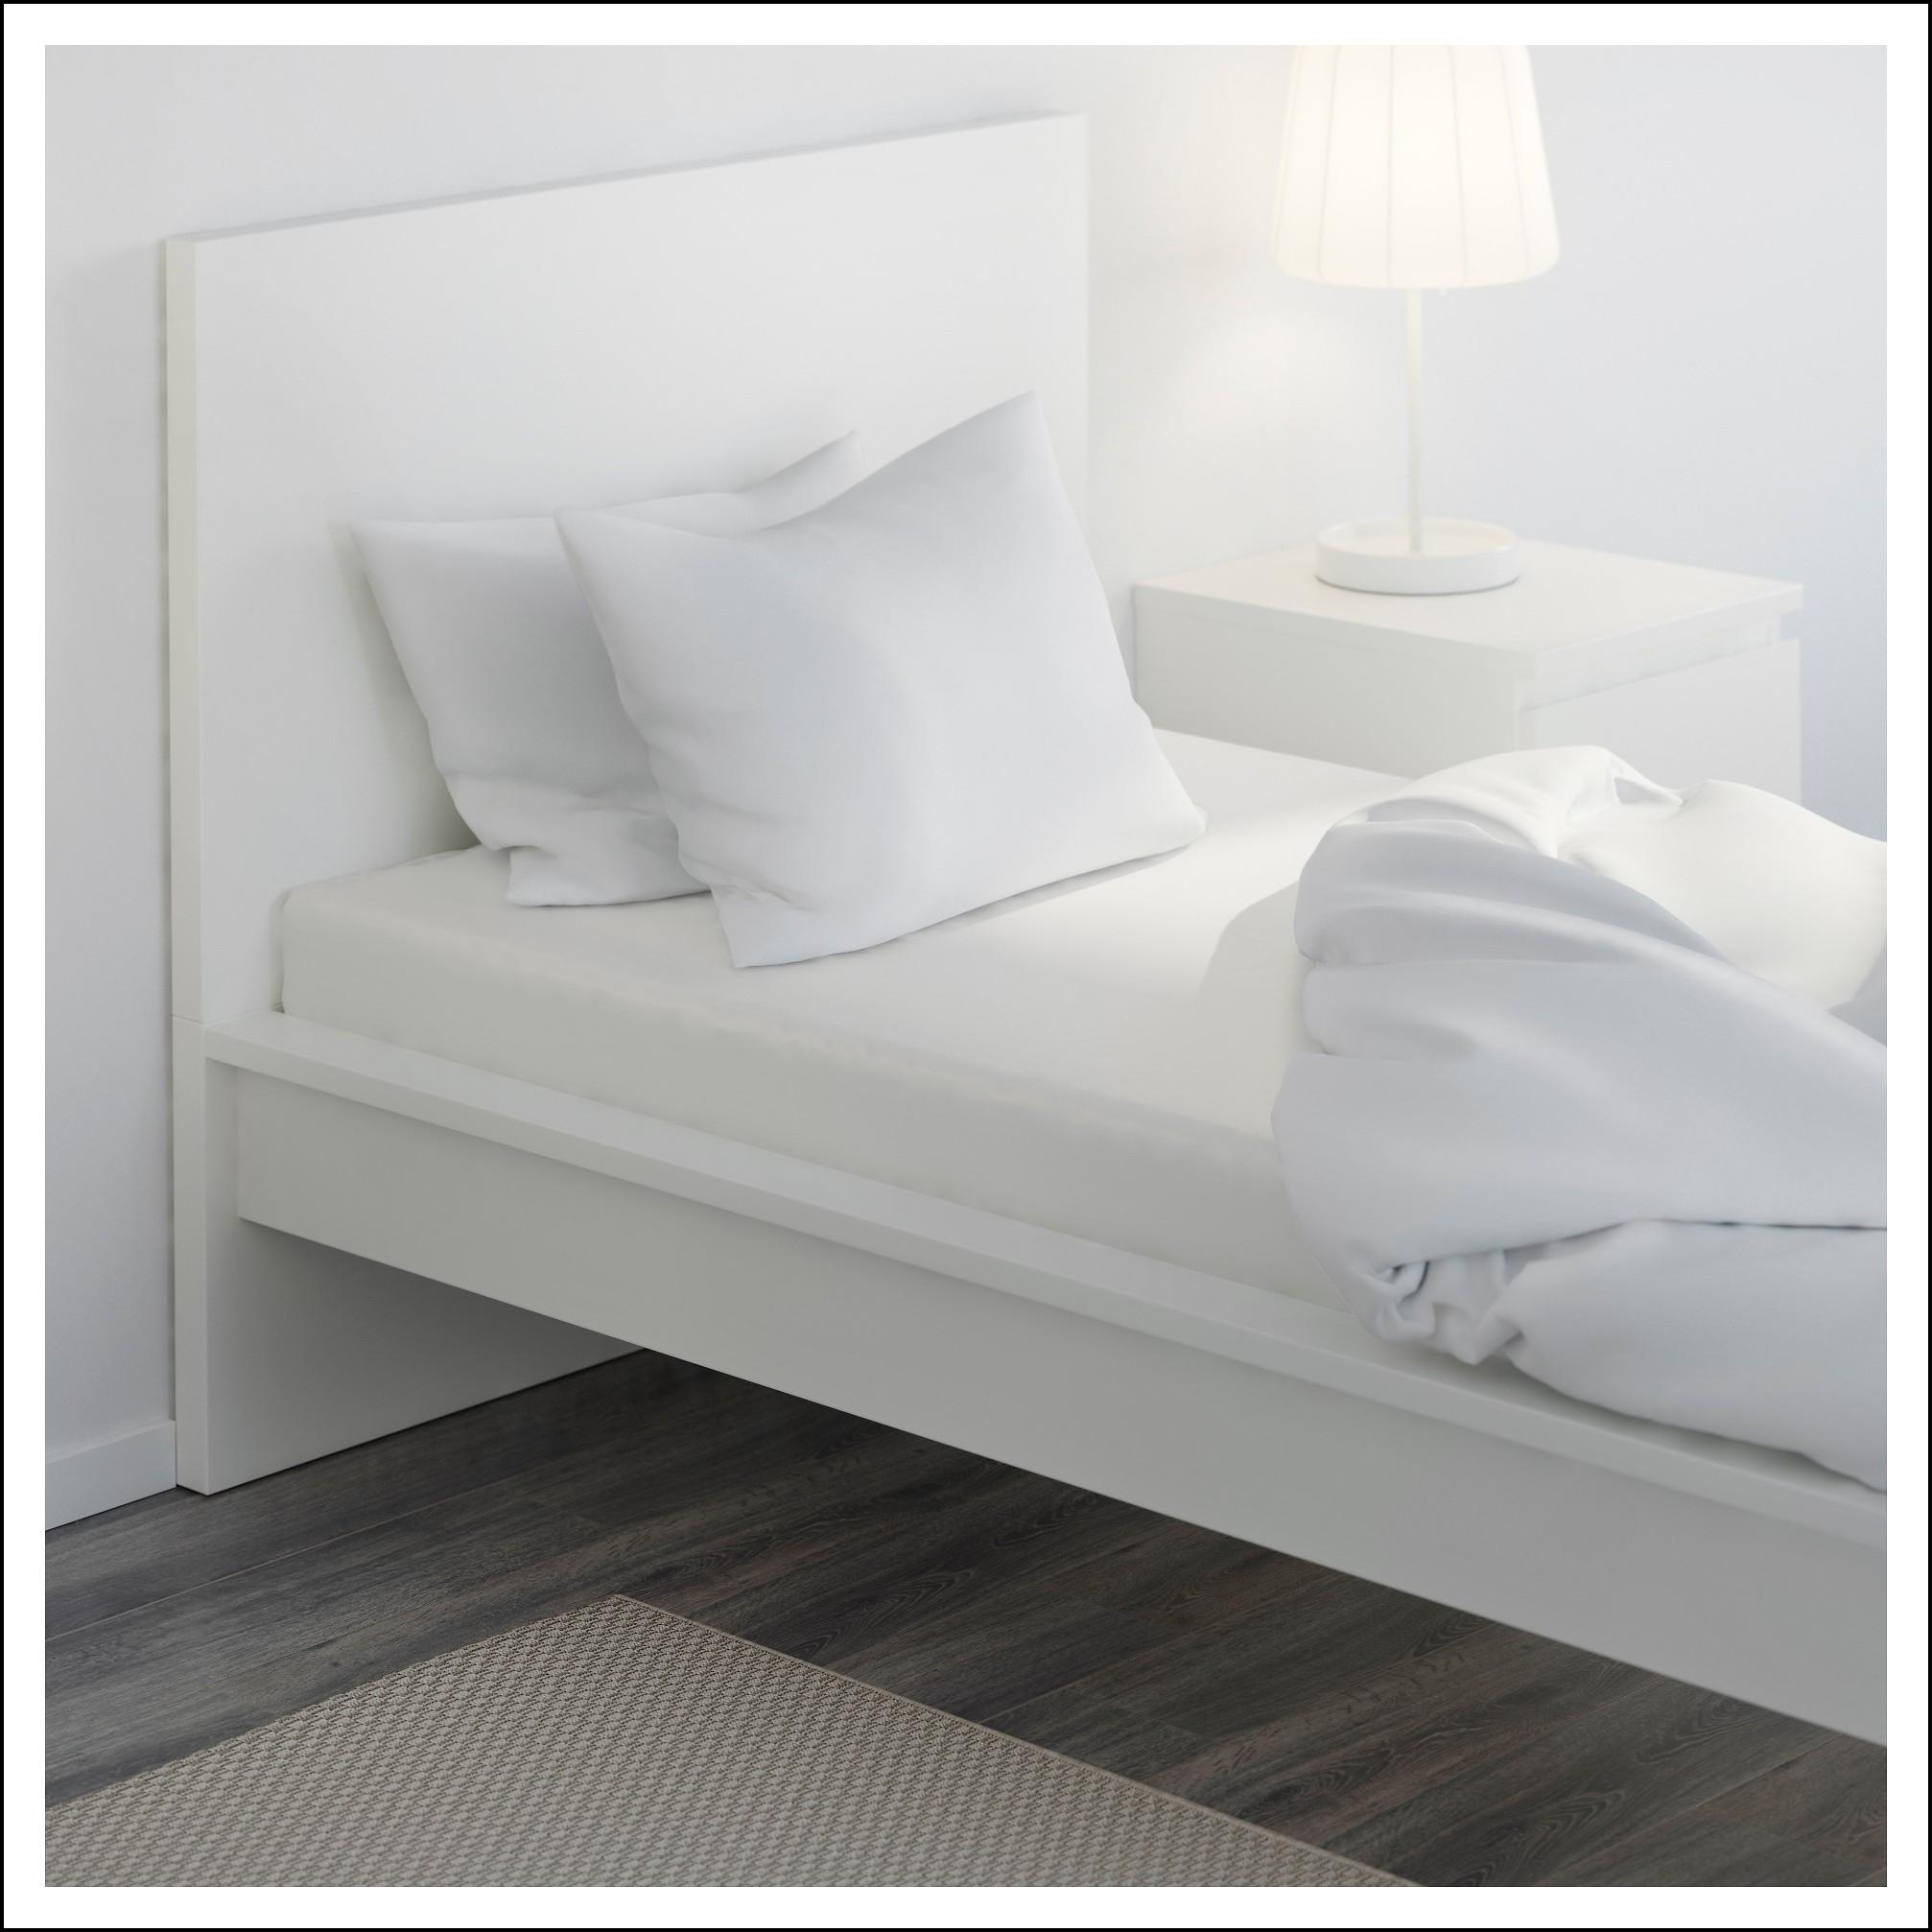 Weiß Bettlaken Ikea